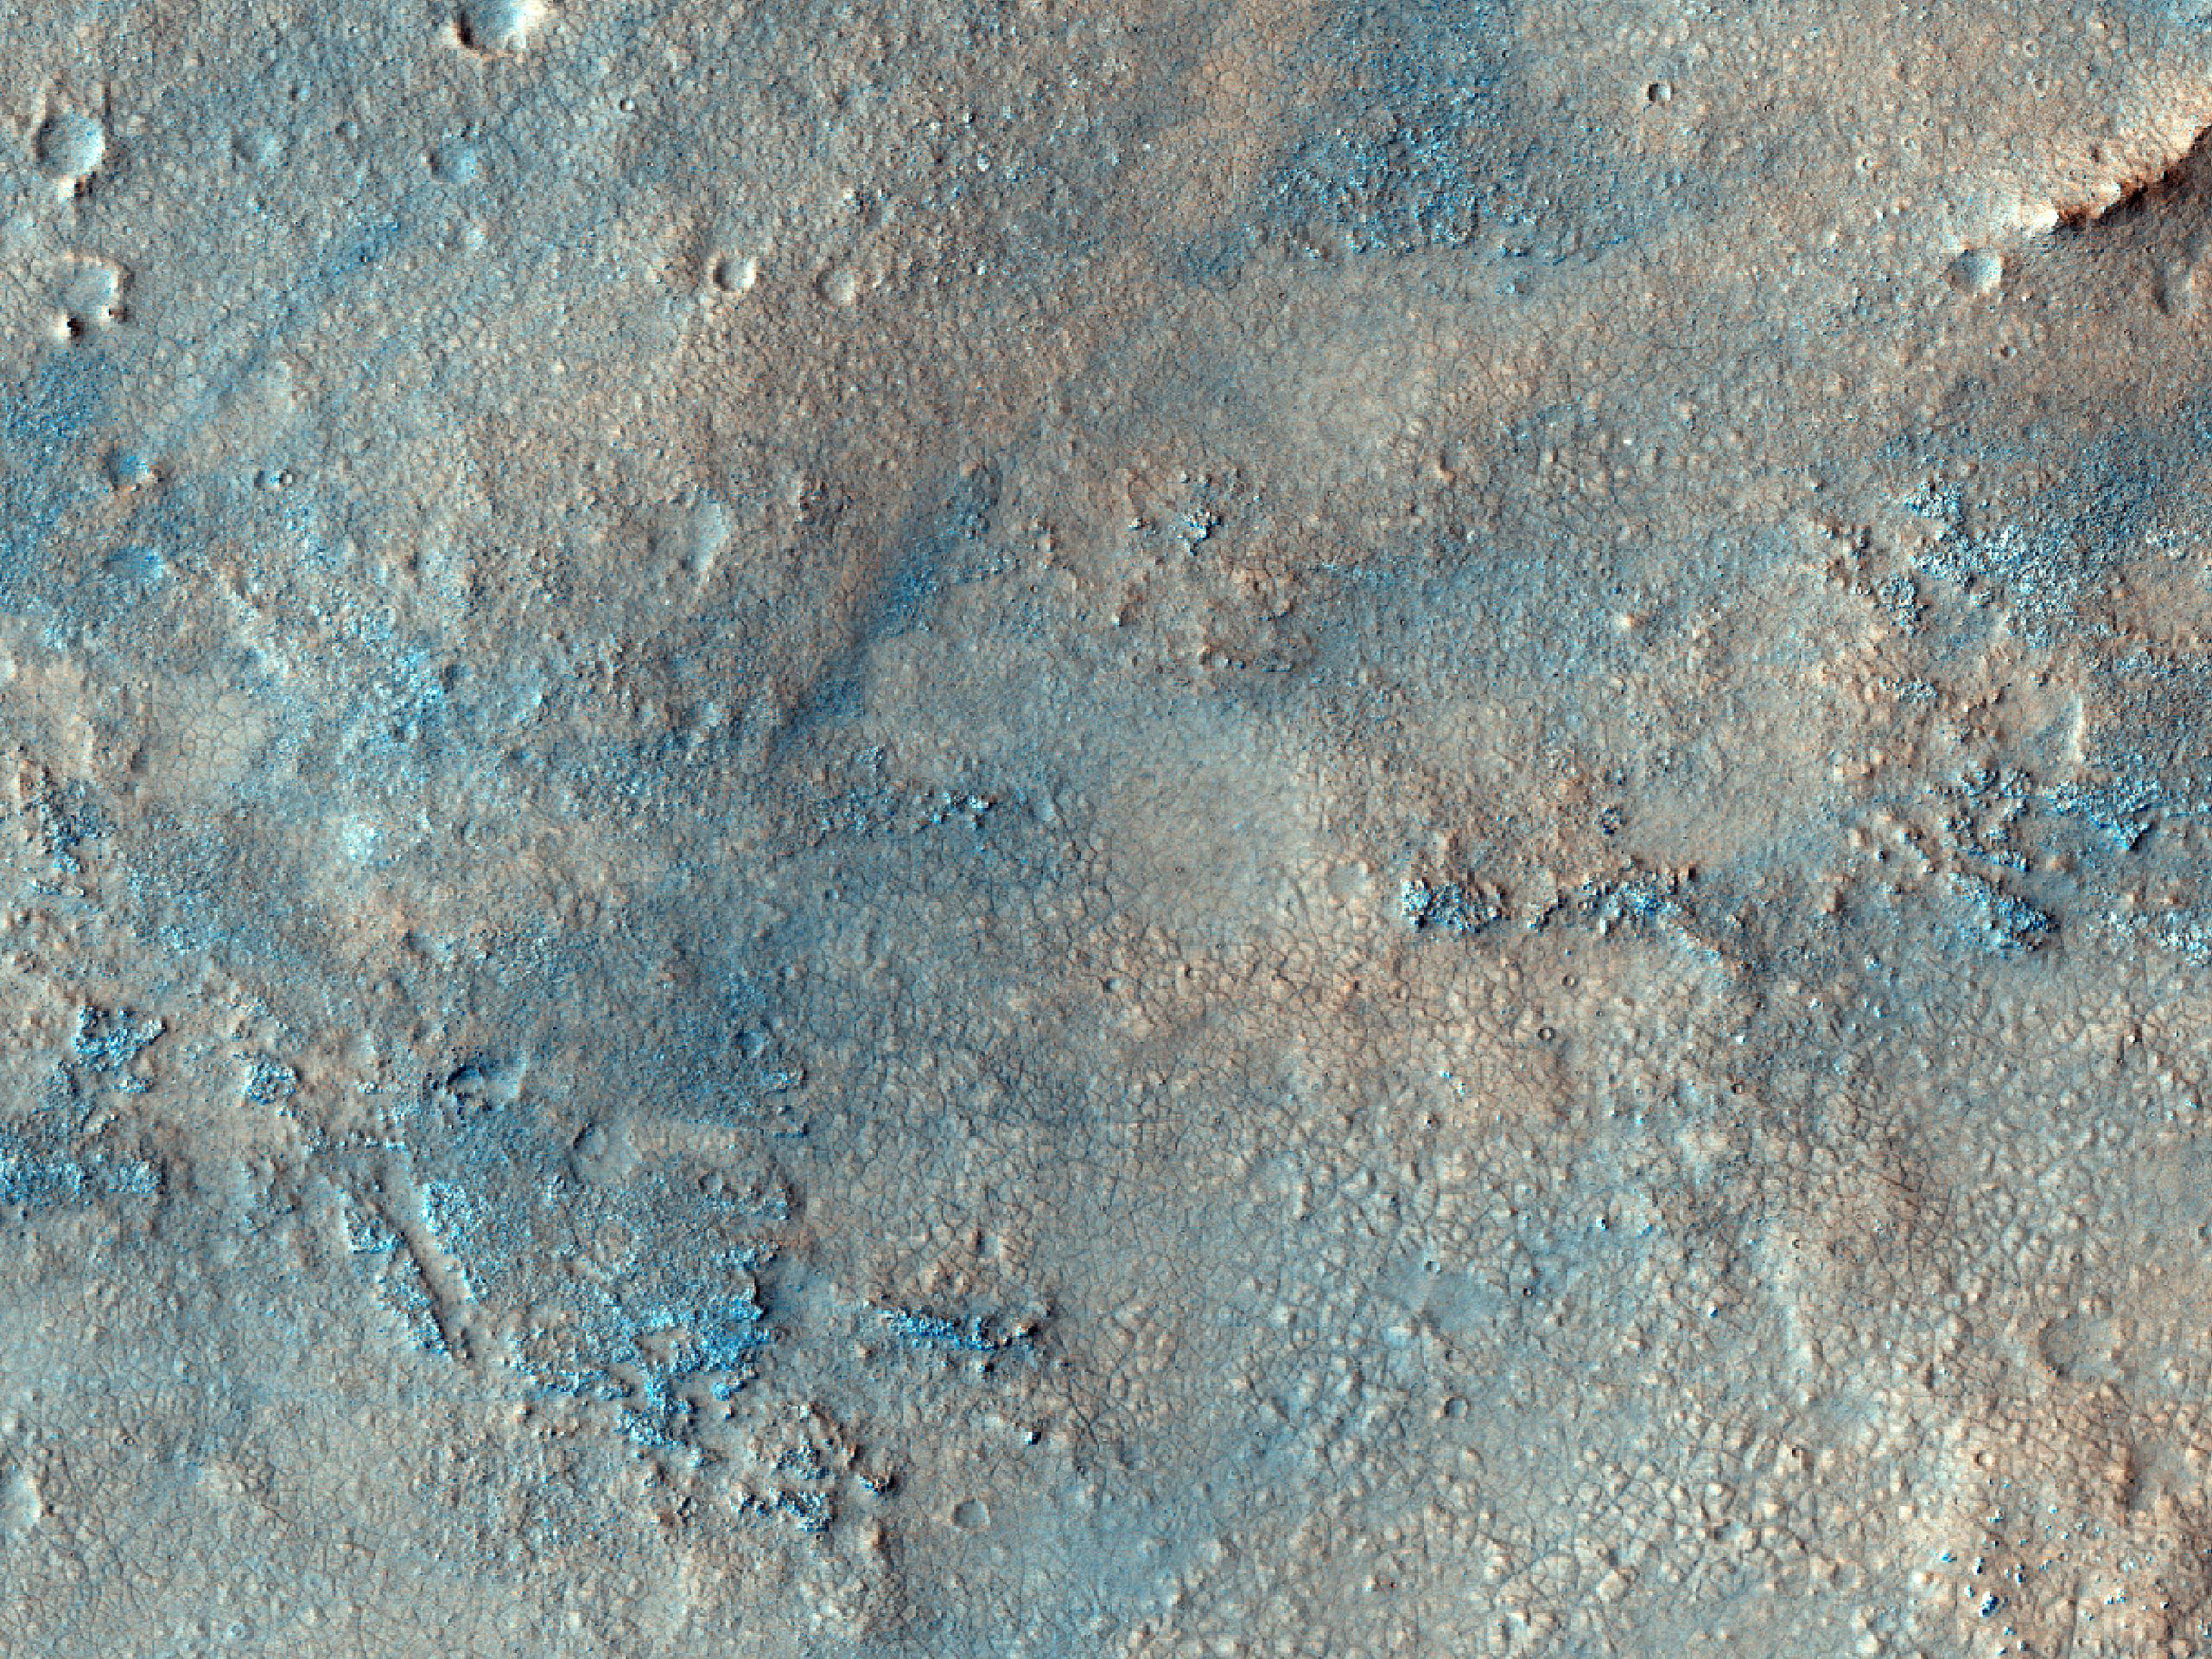 Floor of Antoniadi Crater